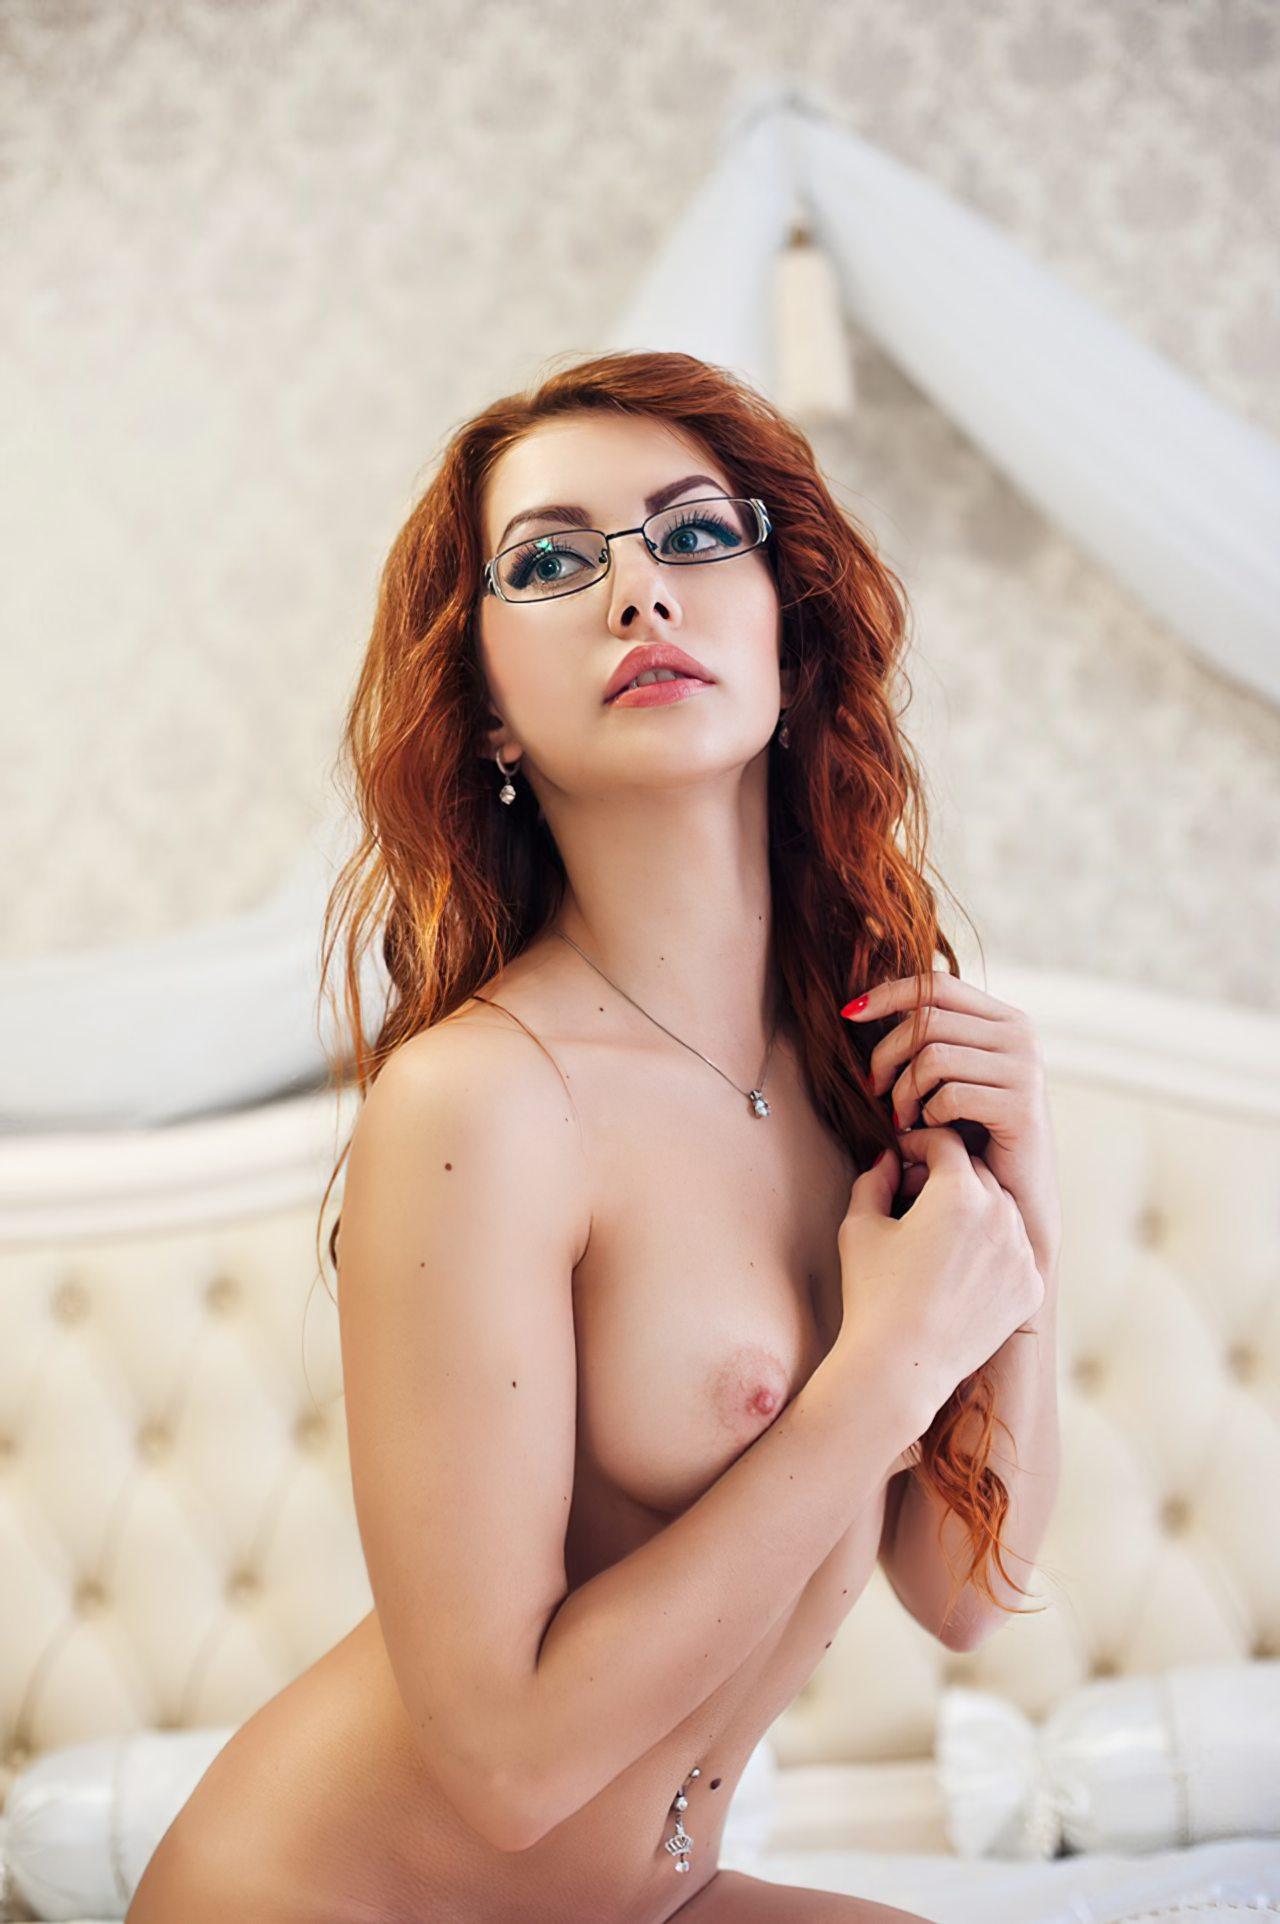 Fotos Mulheres Nuas (33)